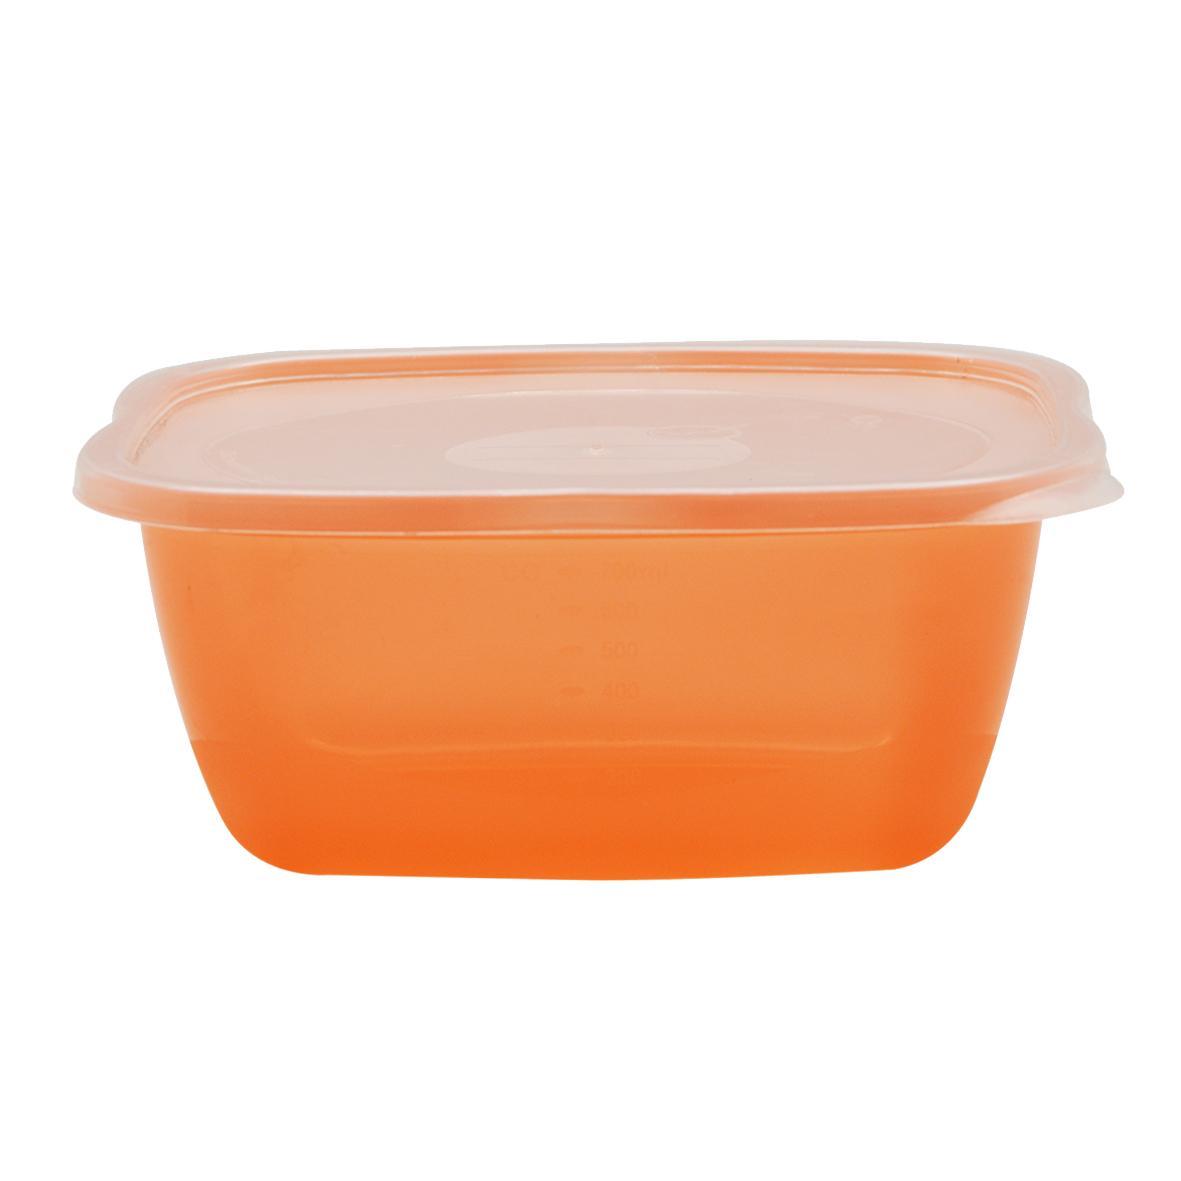 Claris Kotak makan isi 3 pcs - 760 ML / Lunch Box 2733